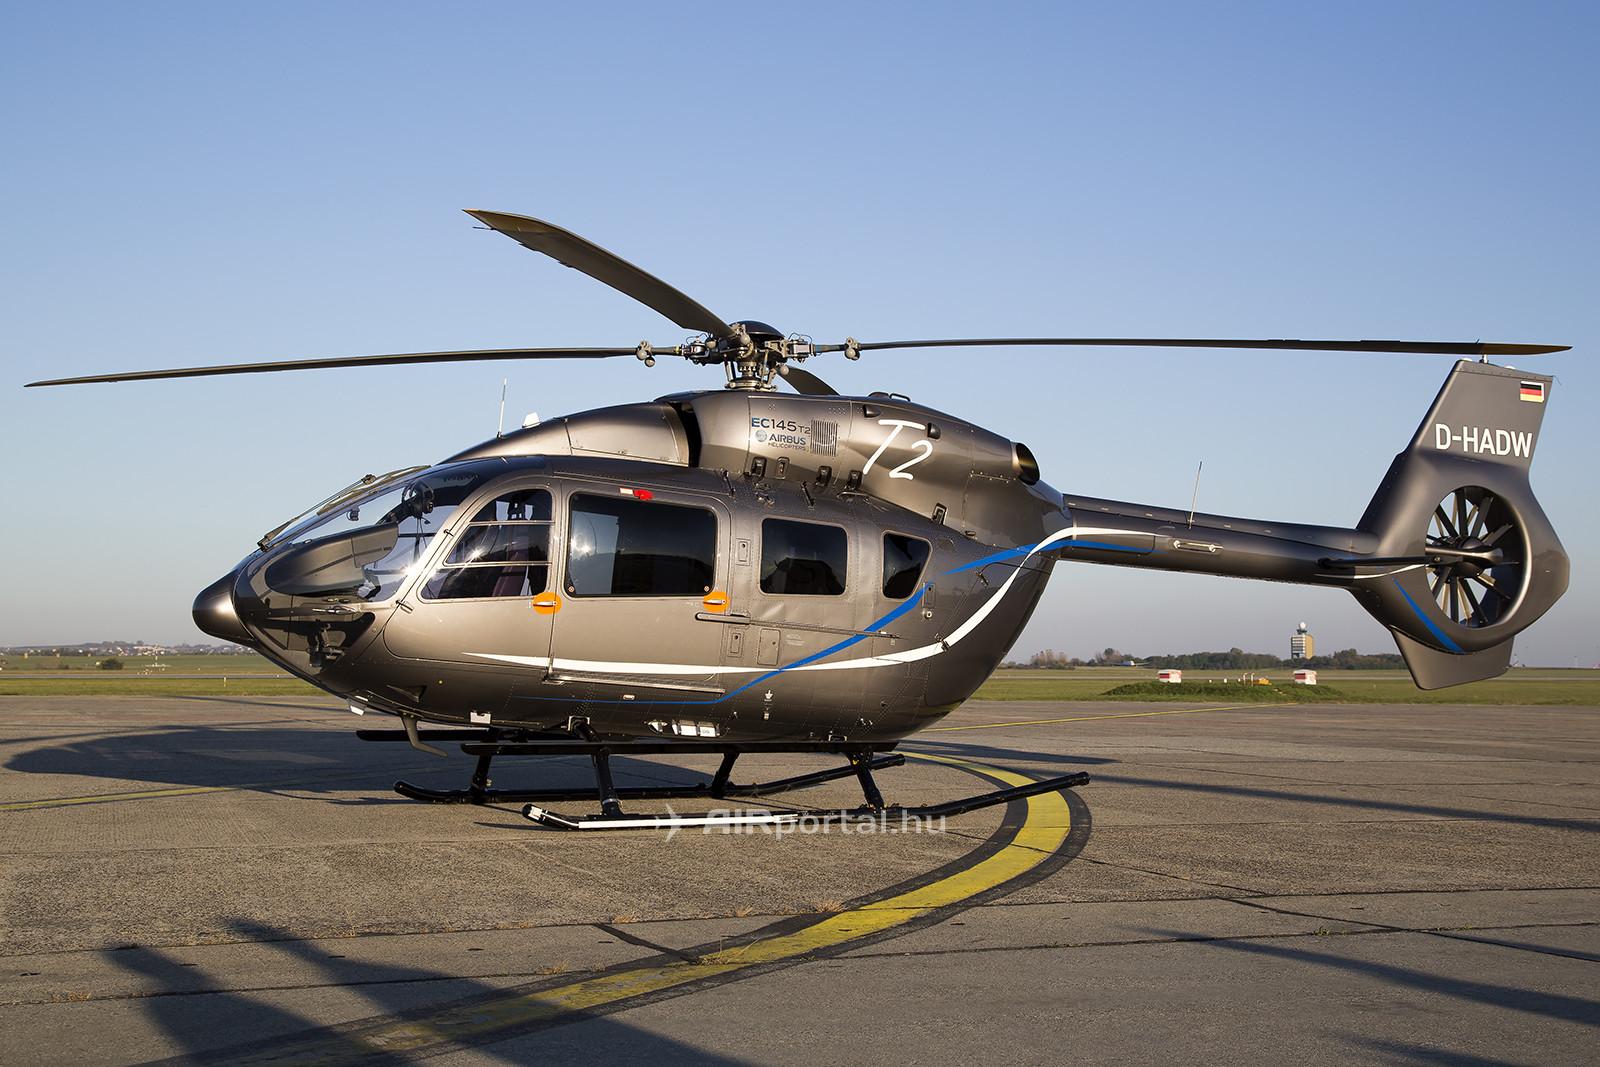 D-HADW Airbus Helicopters EC 145T2 (Fotó: AIRportal.hu)   © AIRportal.hu